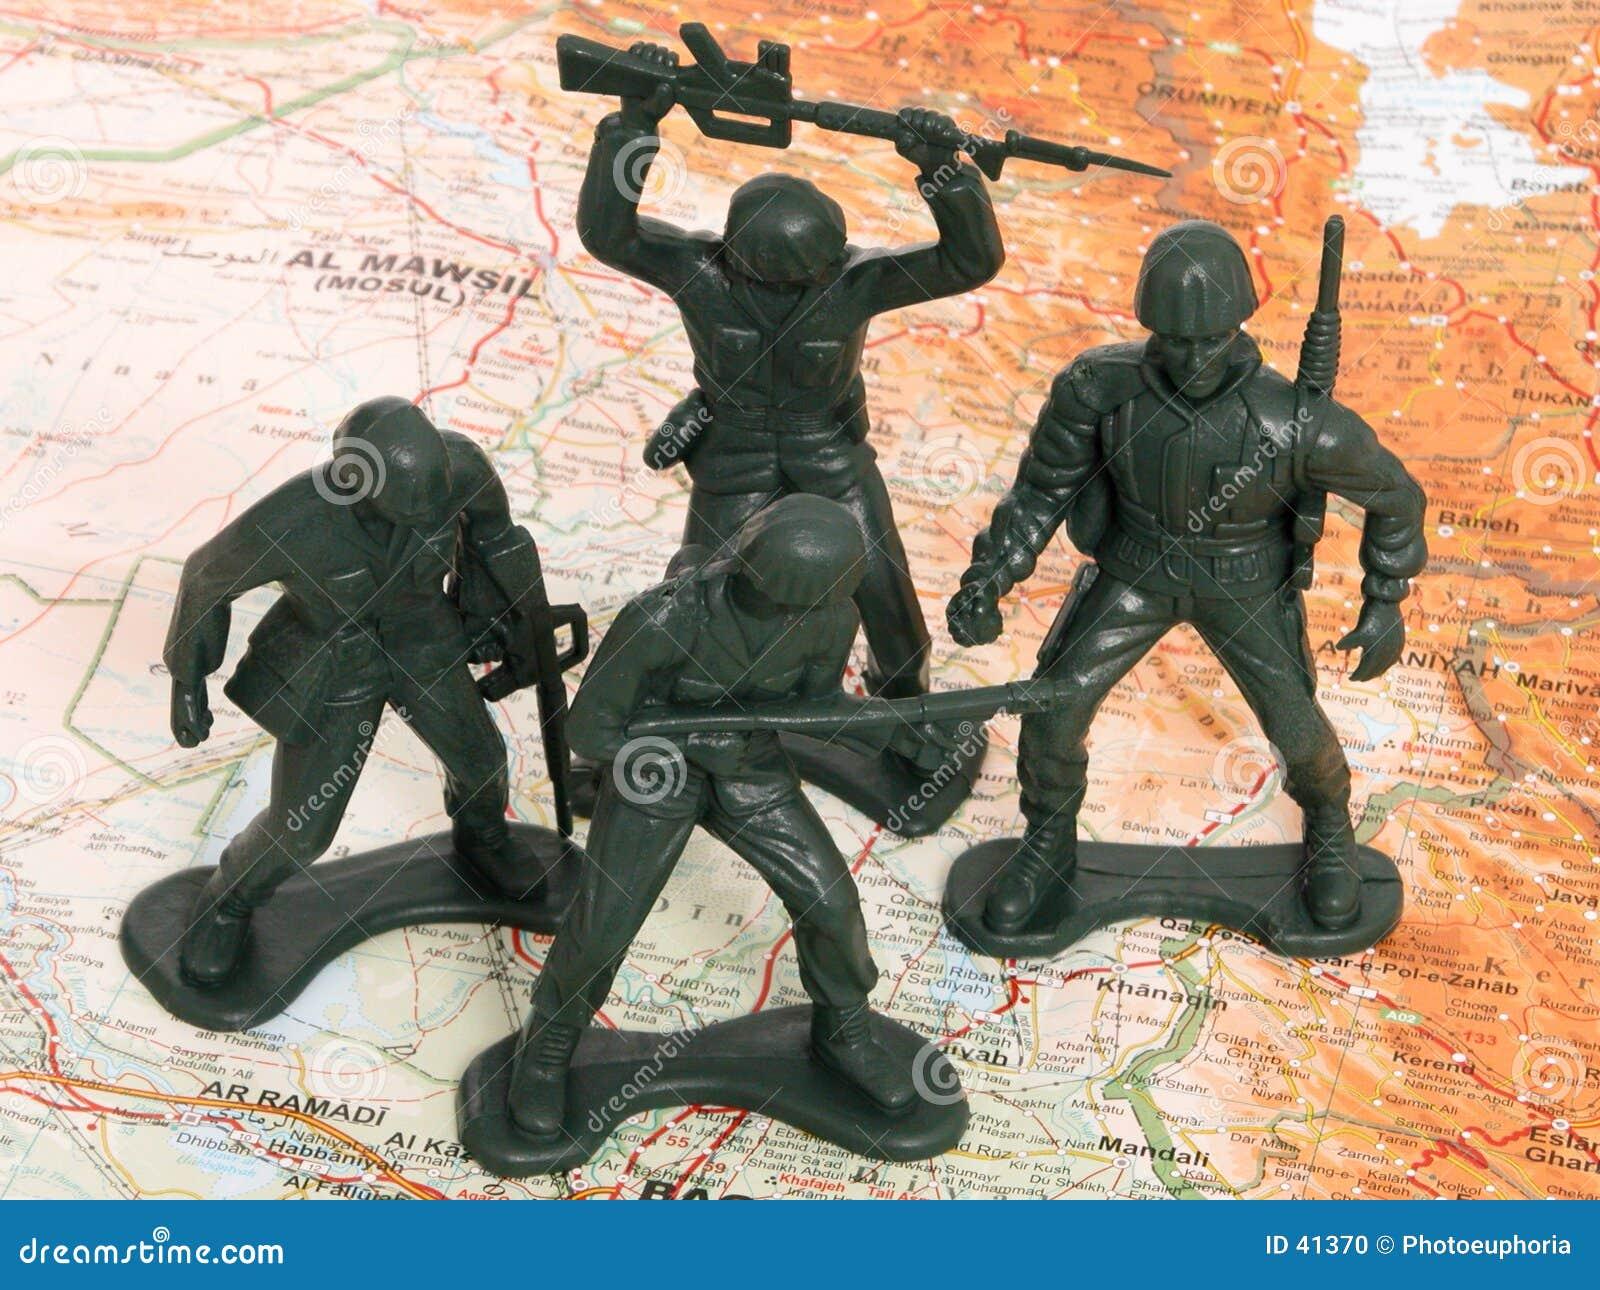 Toy Green Army Men in Iraq